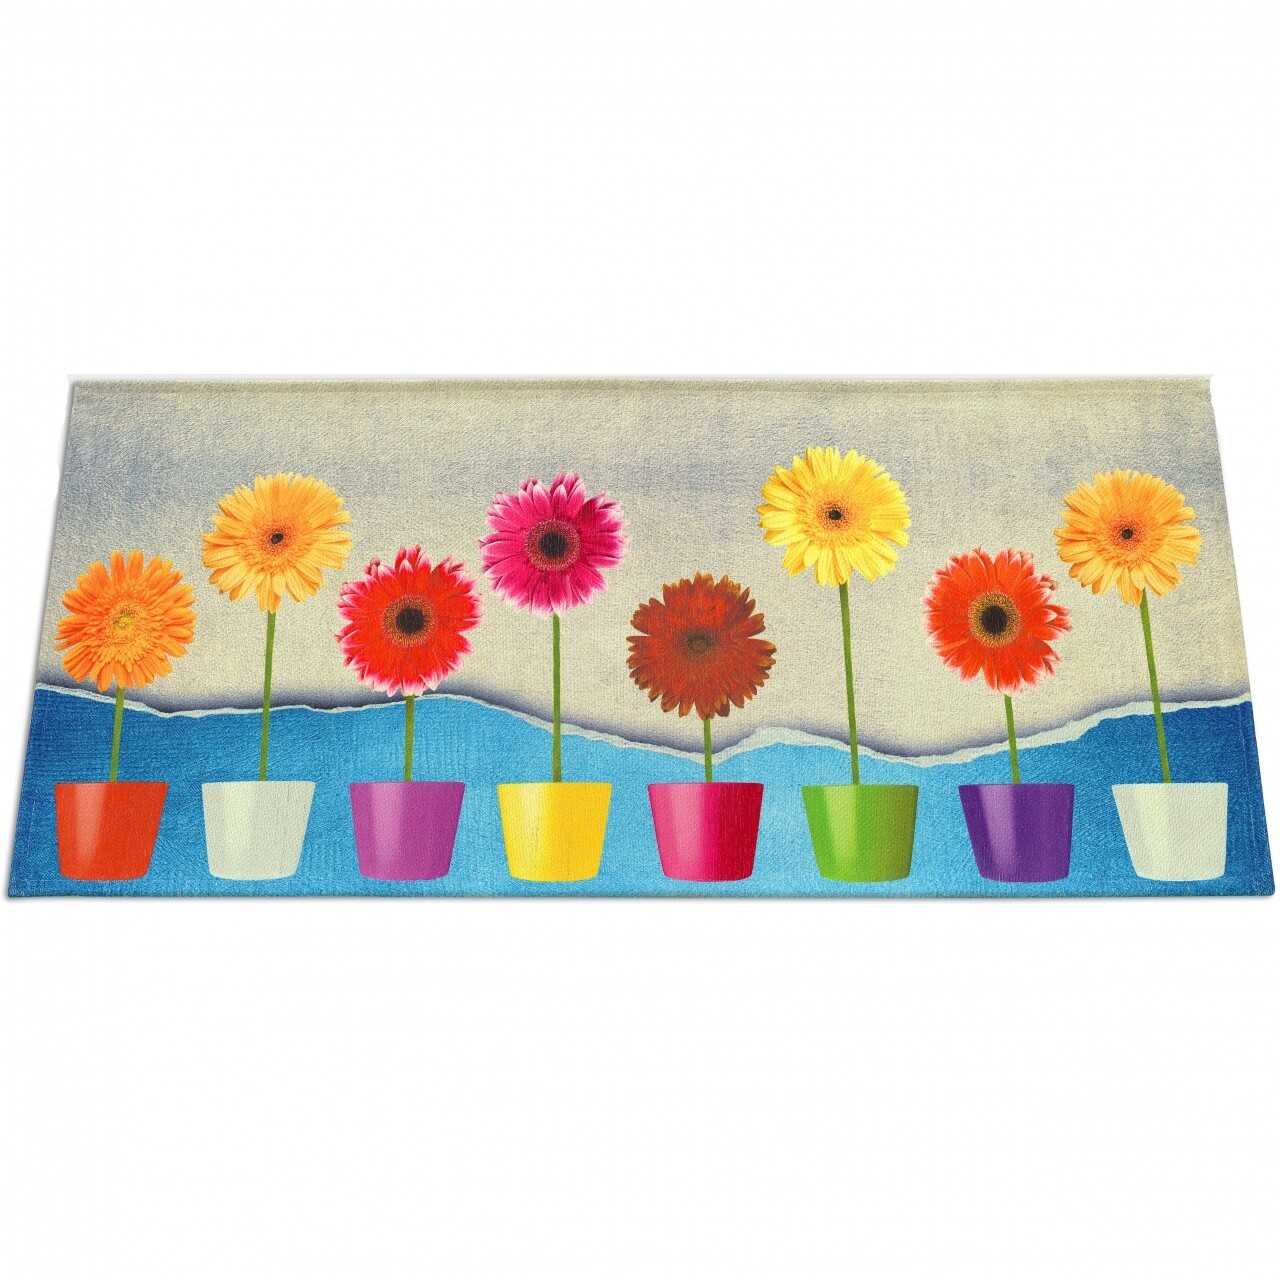 Covor rezistent Webtappeti Flower Power 60 x 190 cm, multicolor